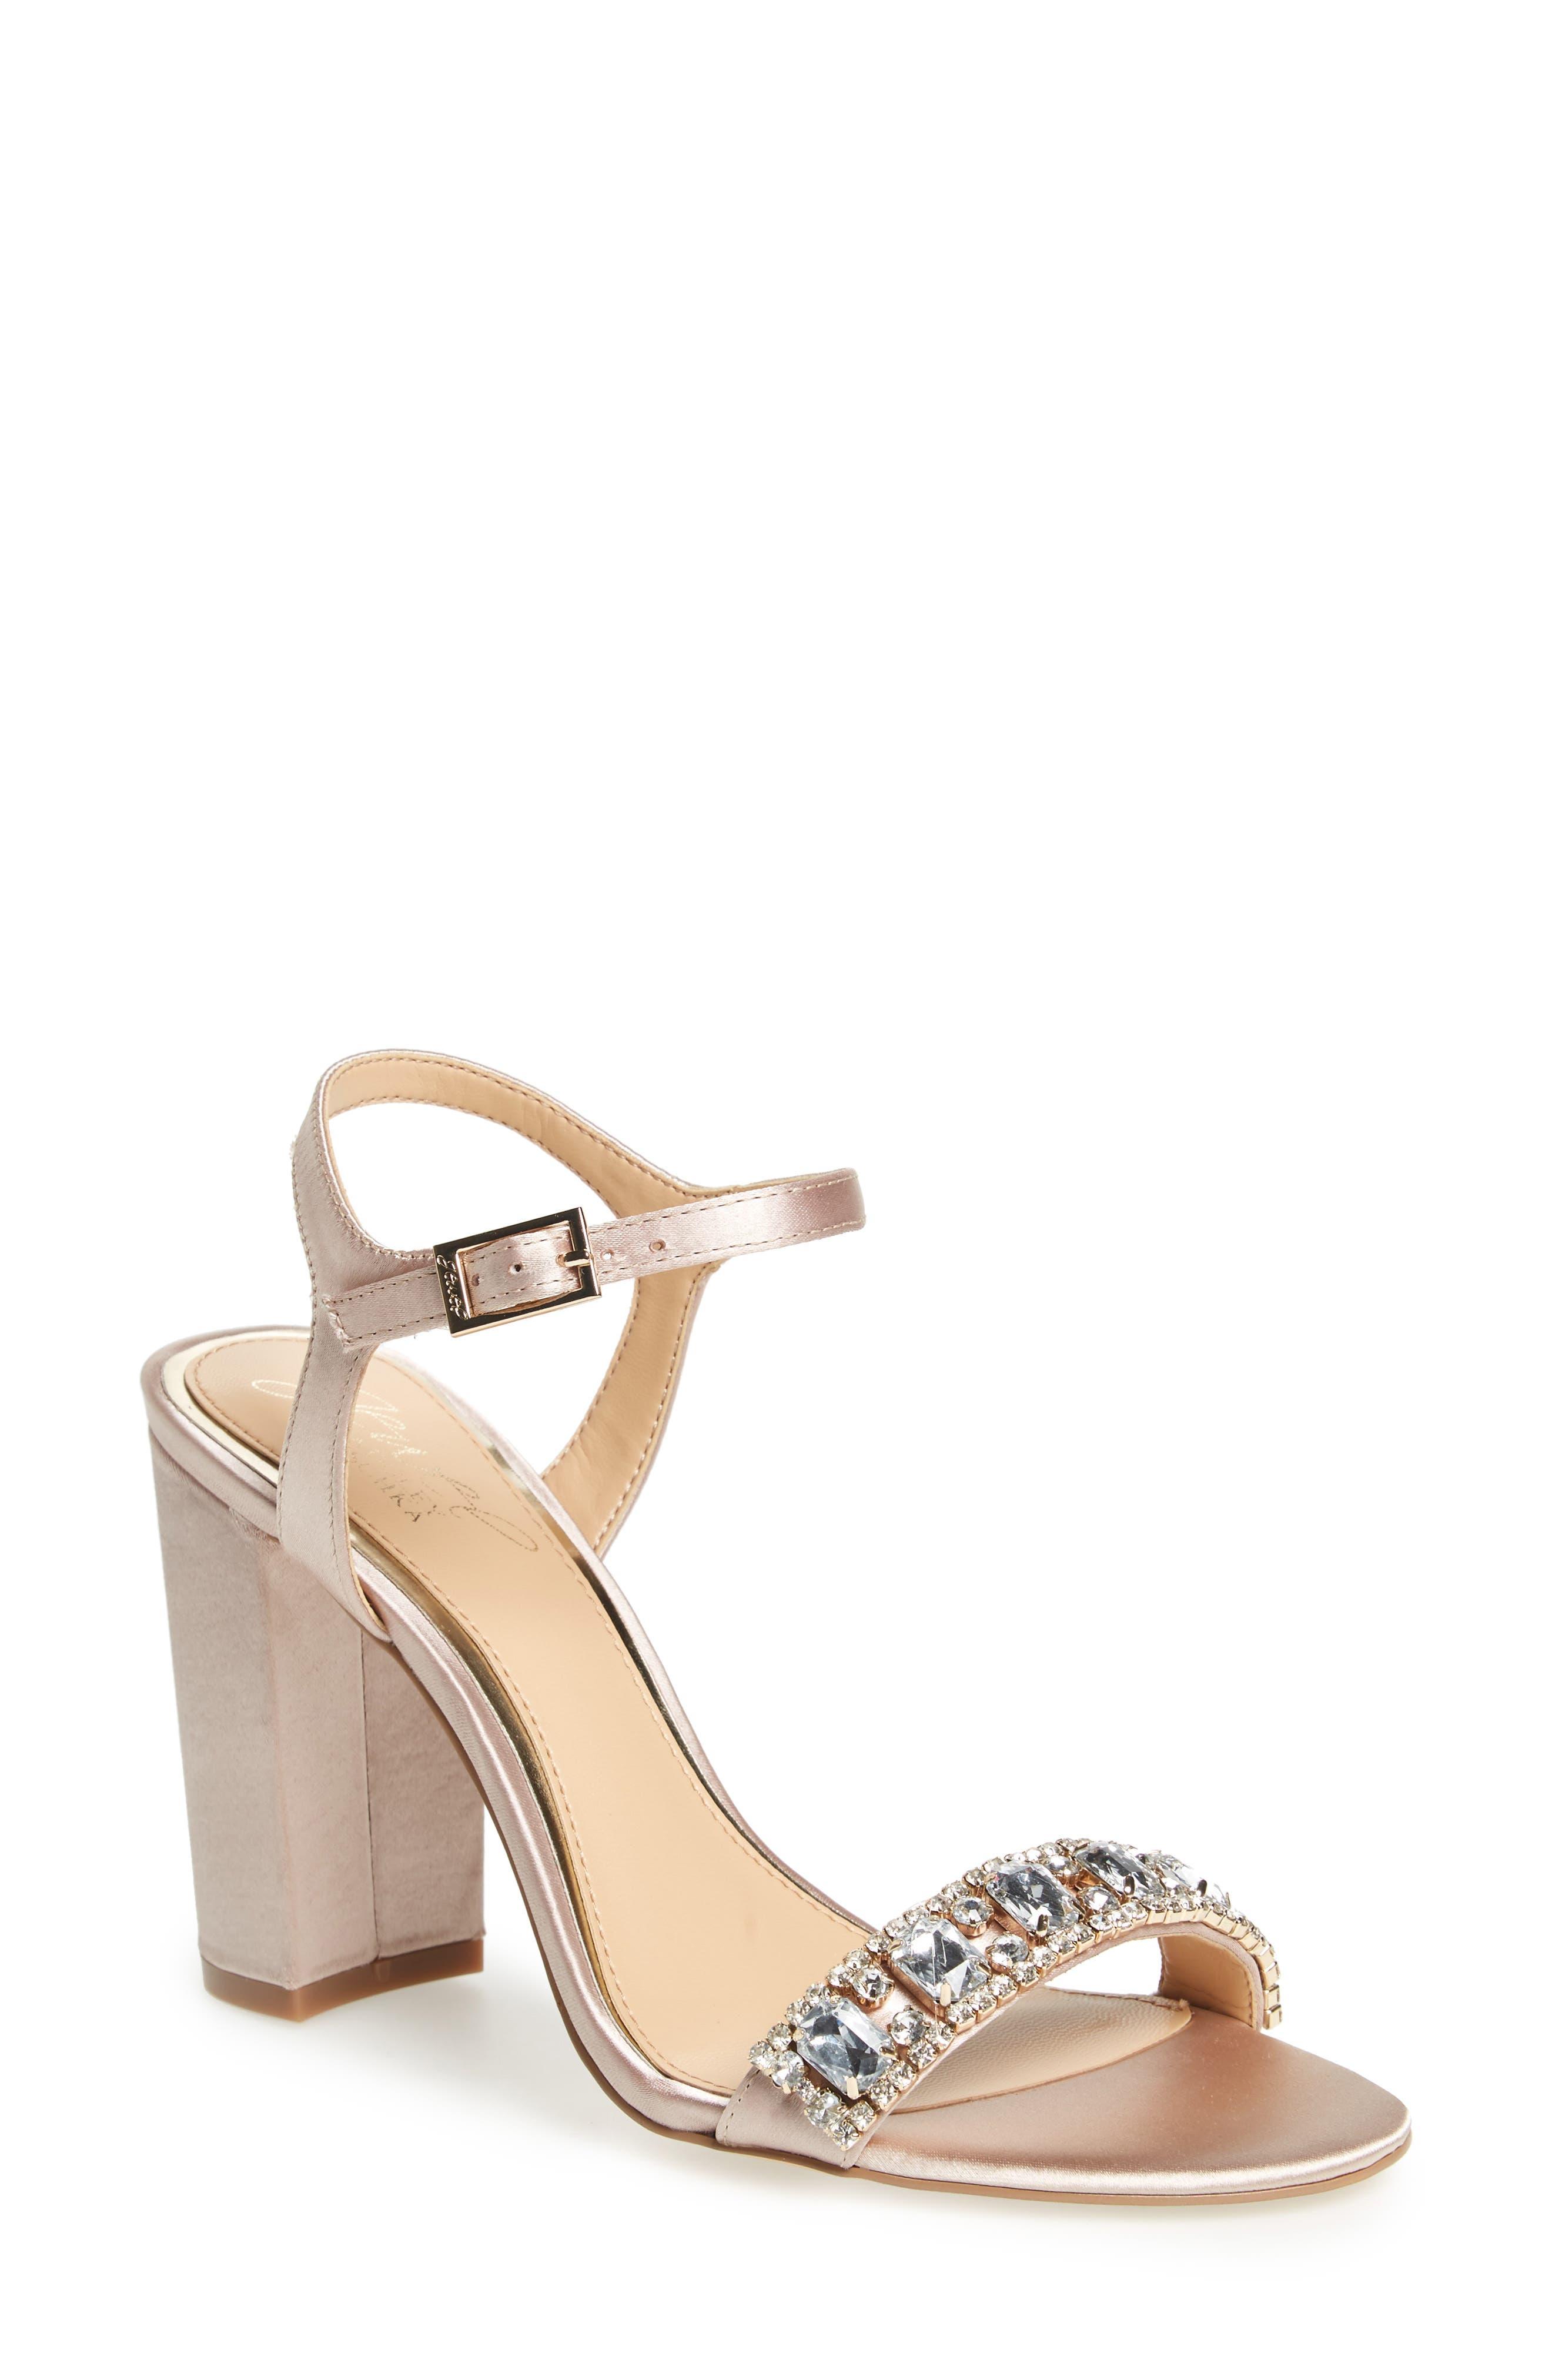 Alternate Image 1 Selected - Jewel Badgley Mischka Hendricks Embellished Block Heel Sandal (Women)